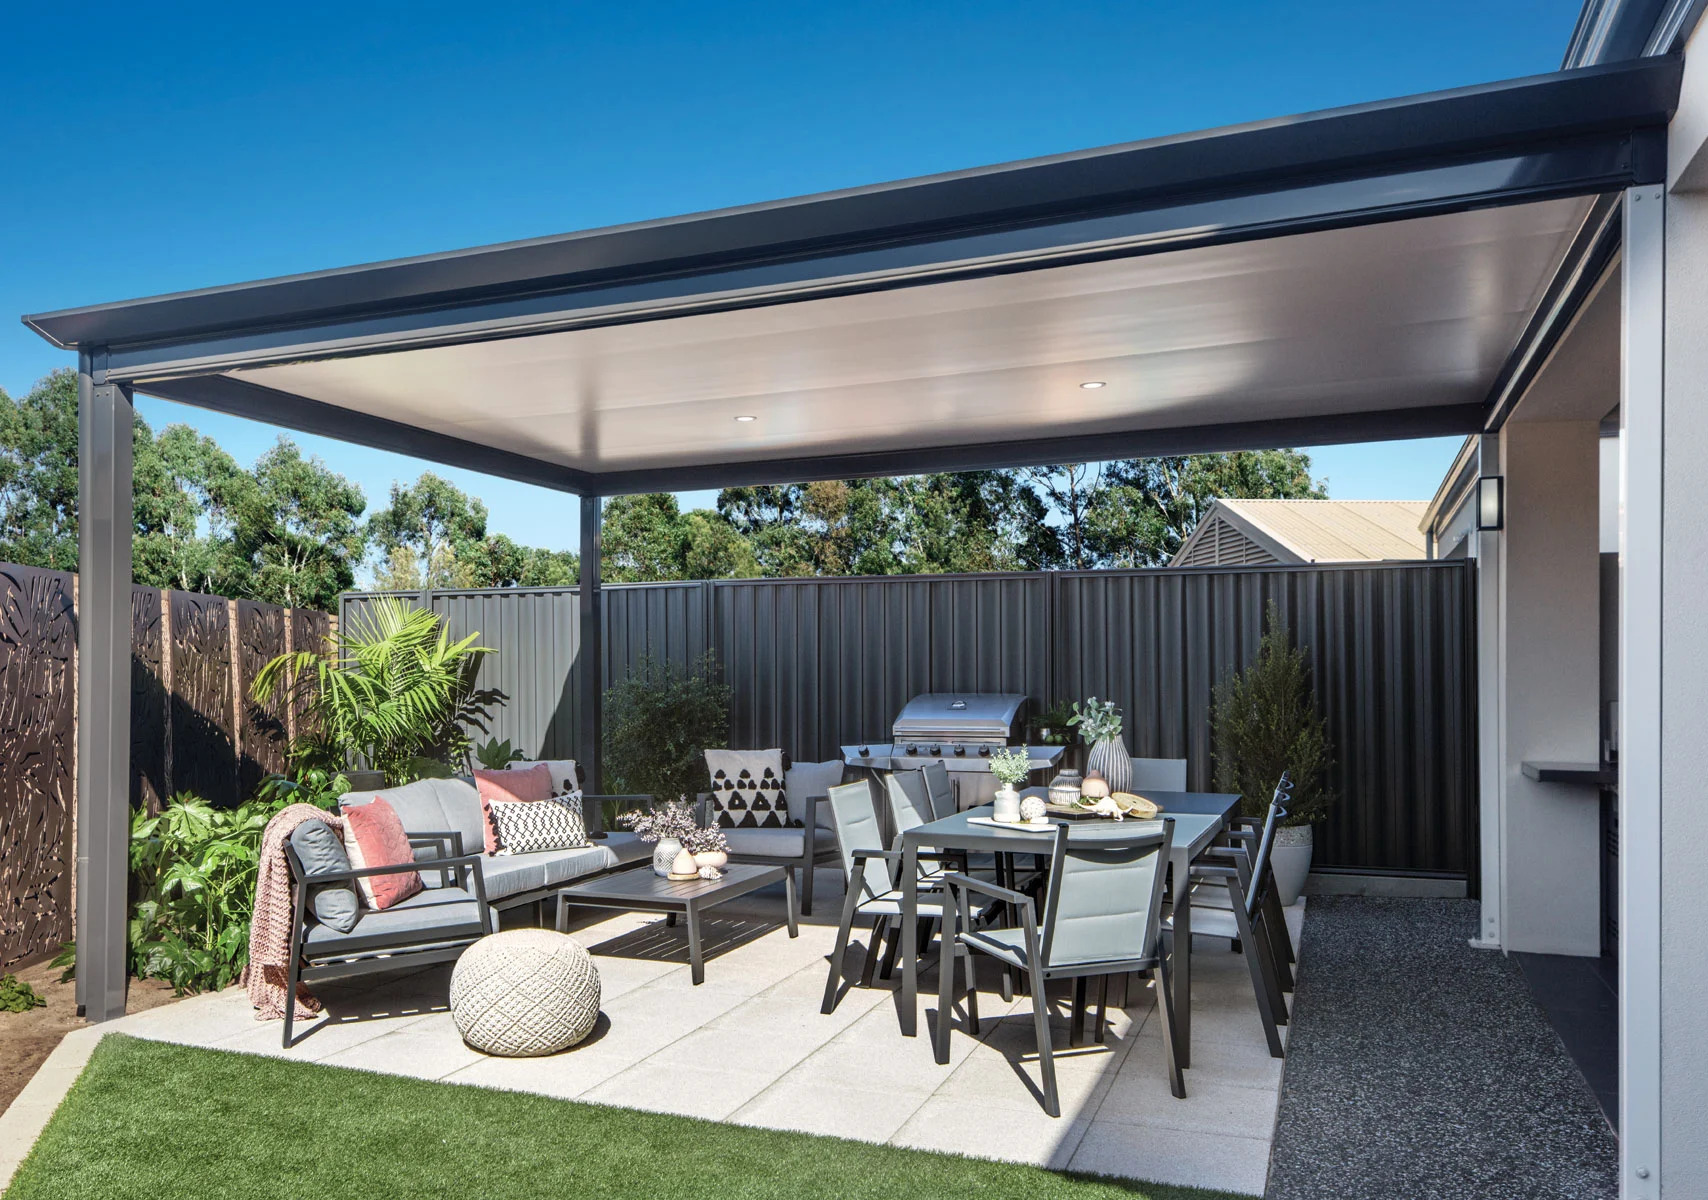 Use strategic patio furniture